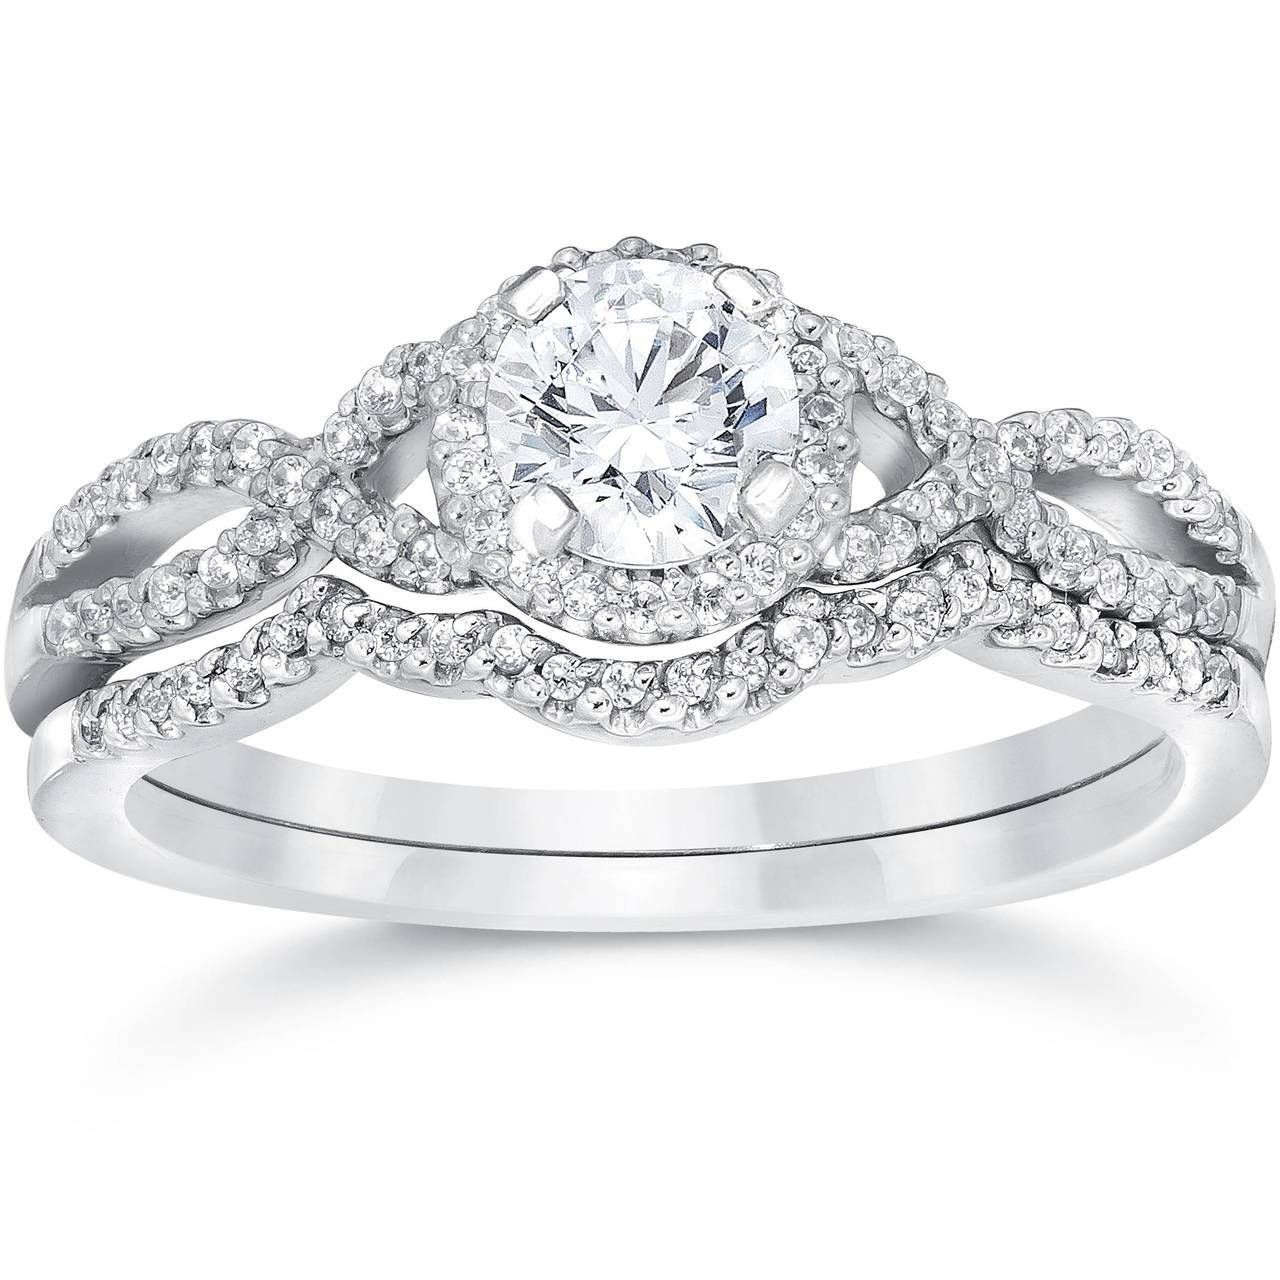 34ct diamond infinity engagement wedding ring set 14k